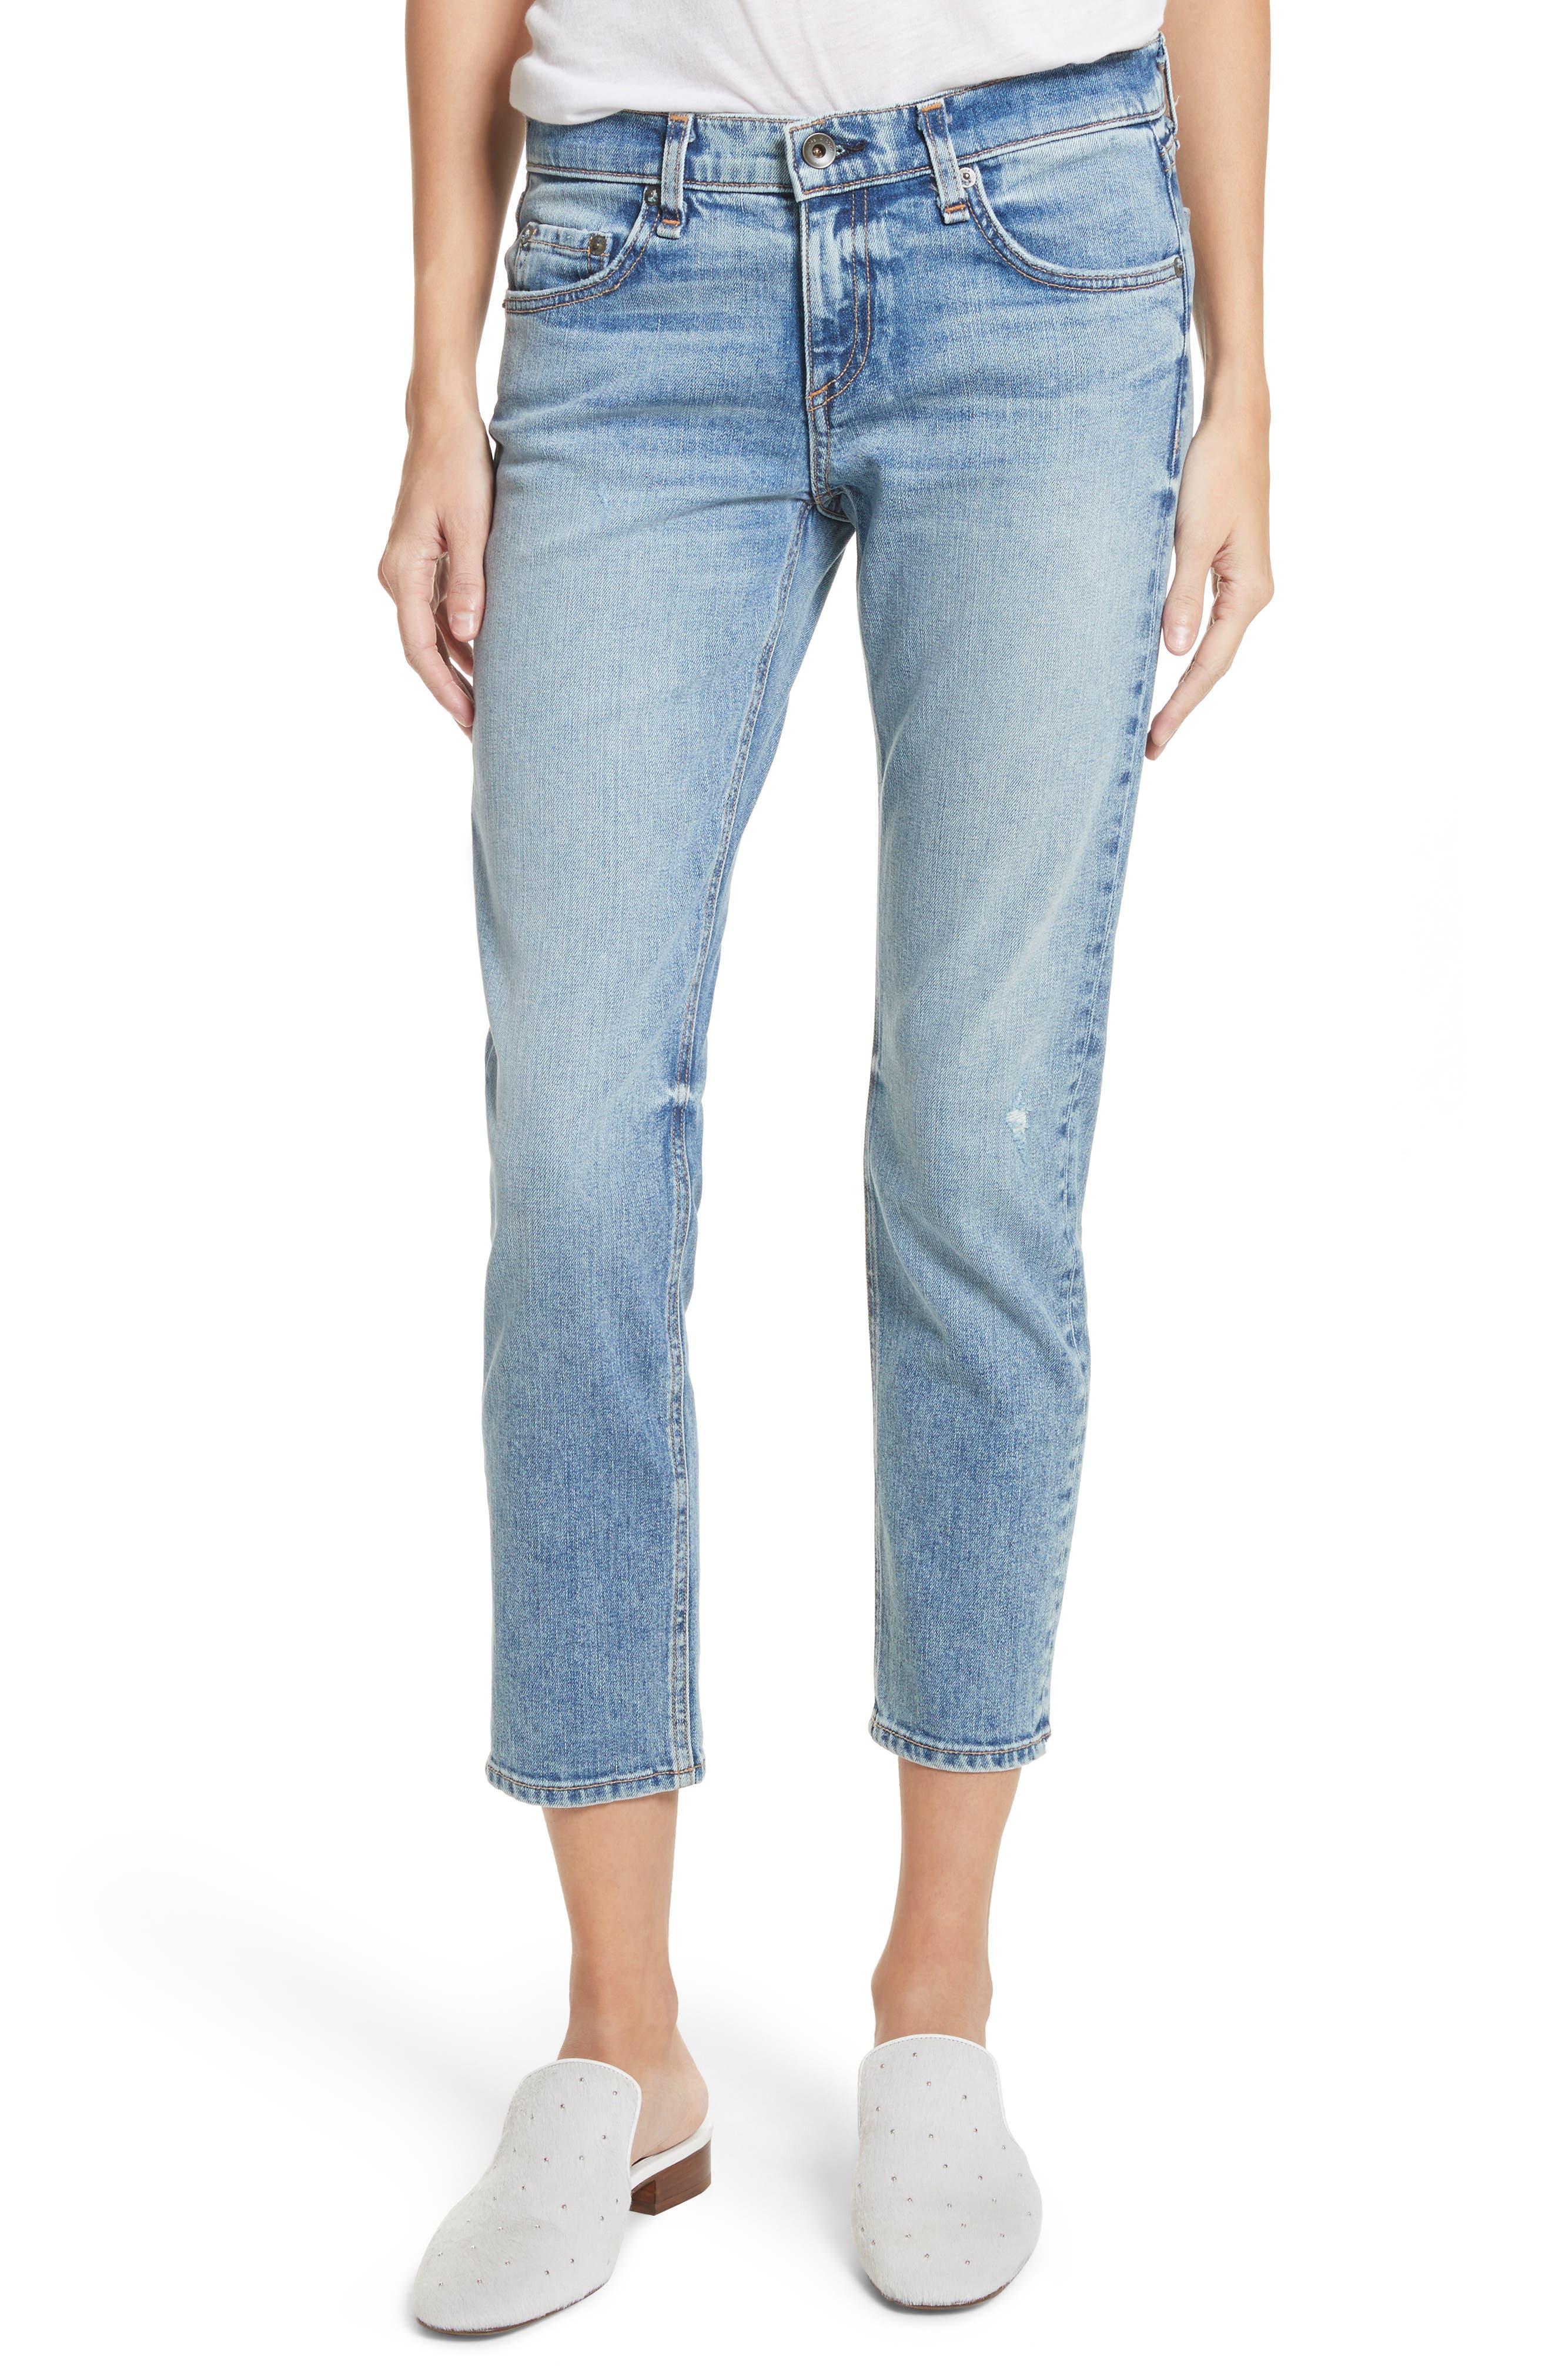 Main Image - rag & bone/JEAN The Dre Ankle Slim Boyfriend Jeans (Alphaville)